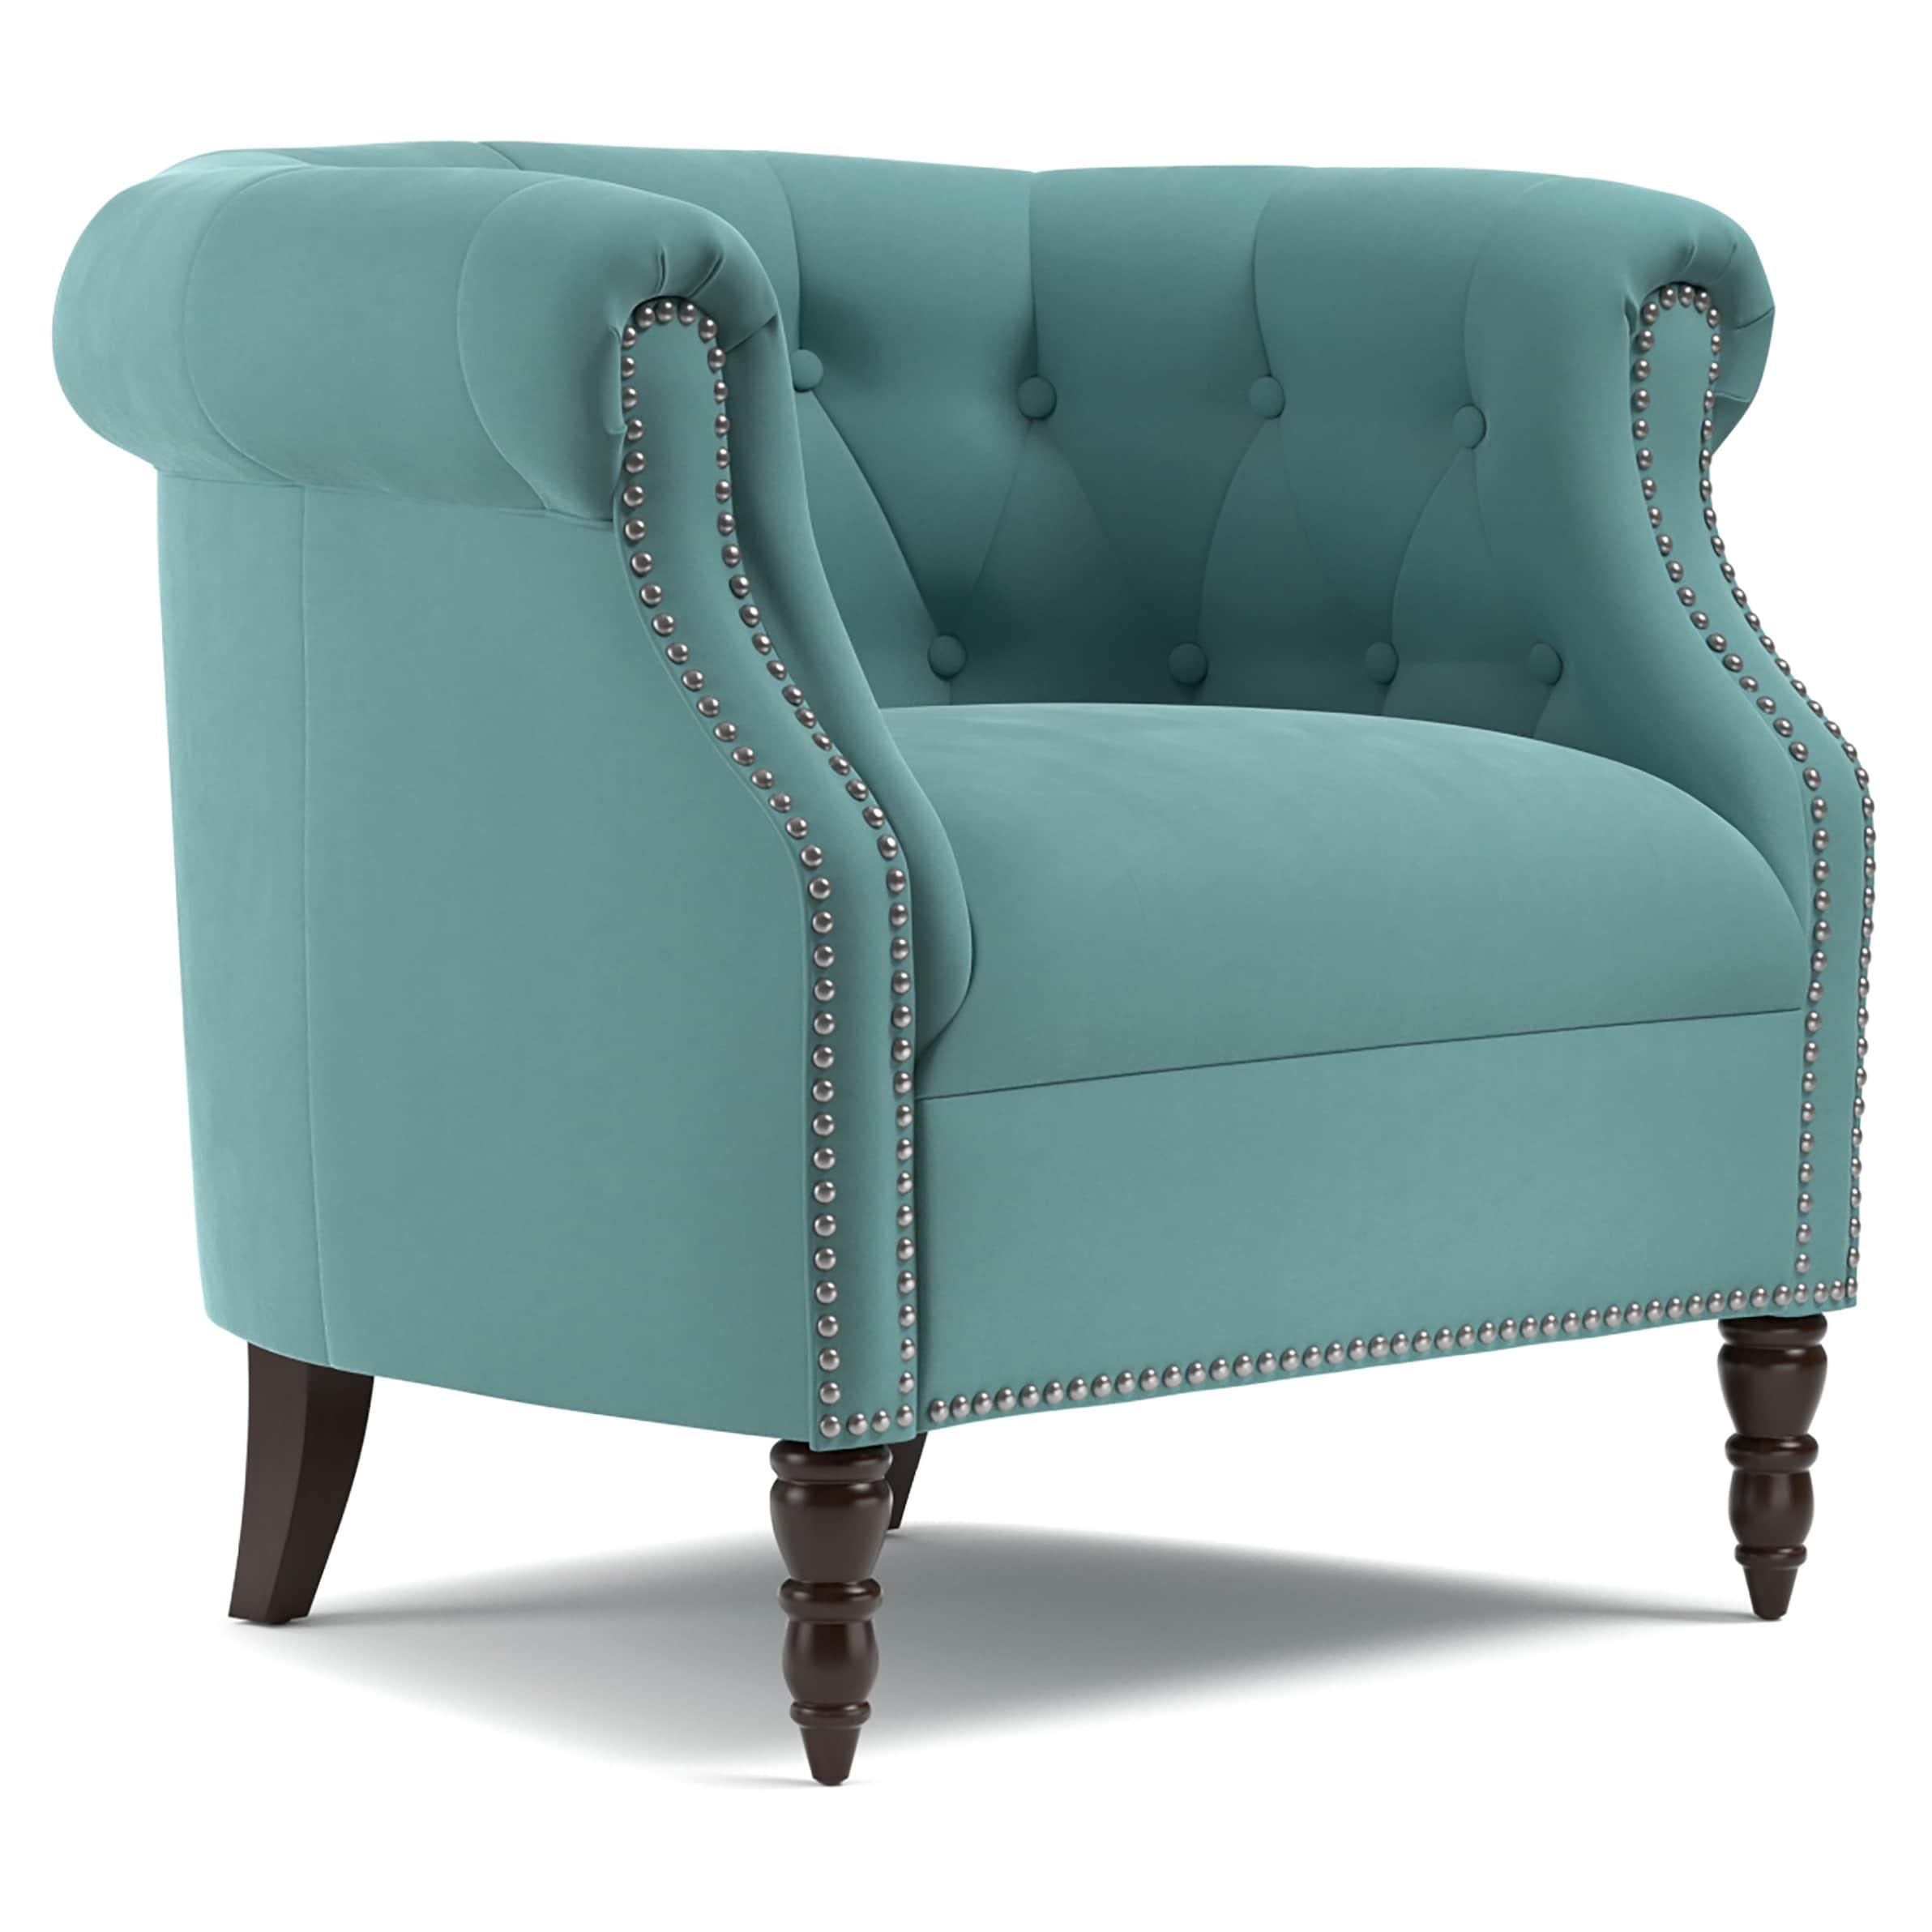 Copper Grove Muir Chesterfield Turquoise Blue Velvet Arm Chair